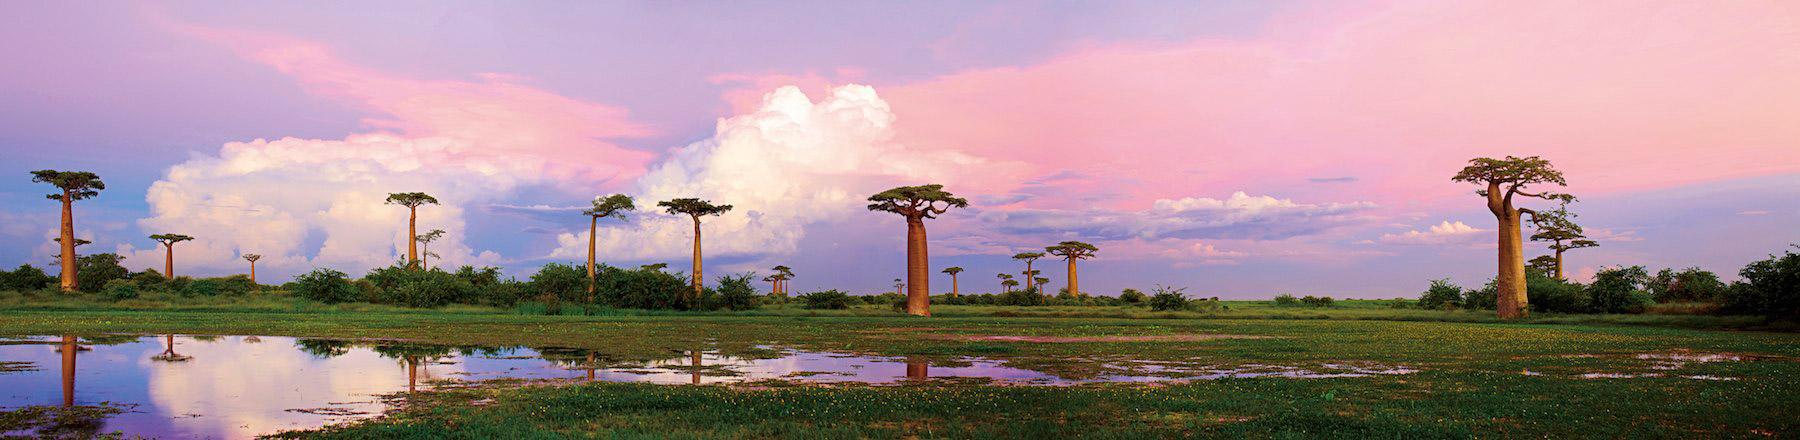 Baobab-panoramic2-madgascar-heinrich-van-den-berg